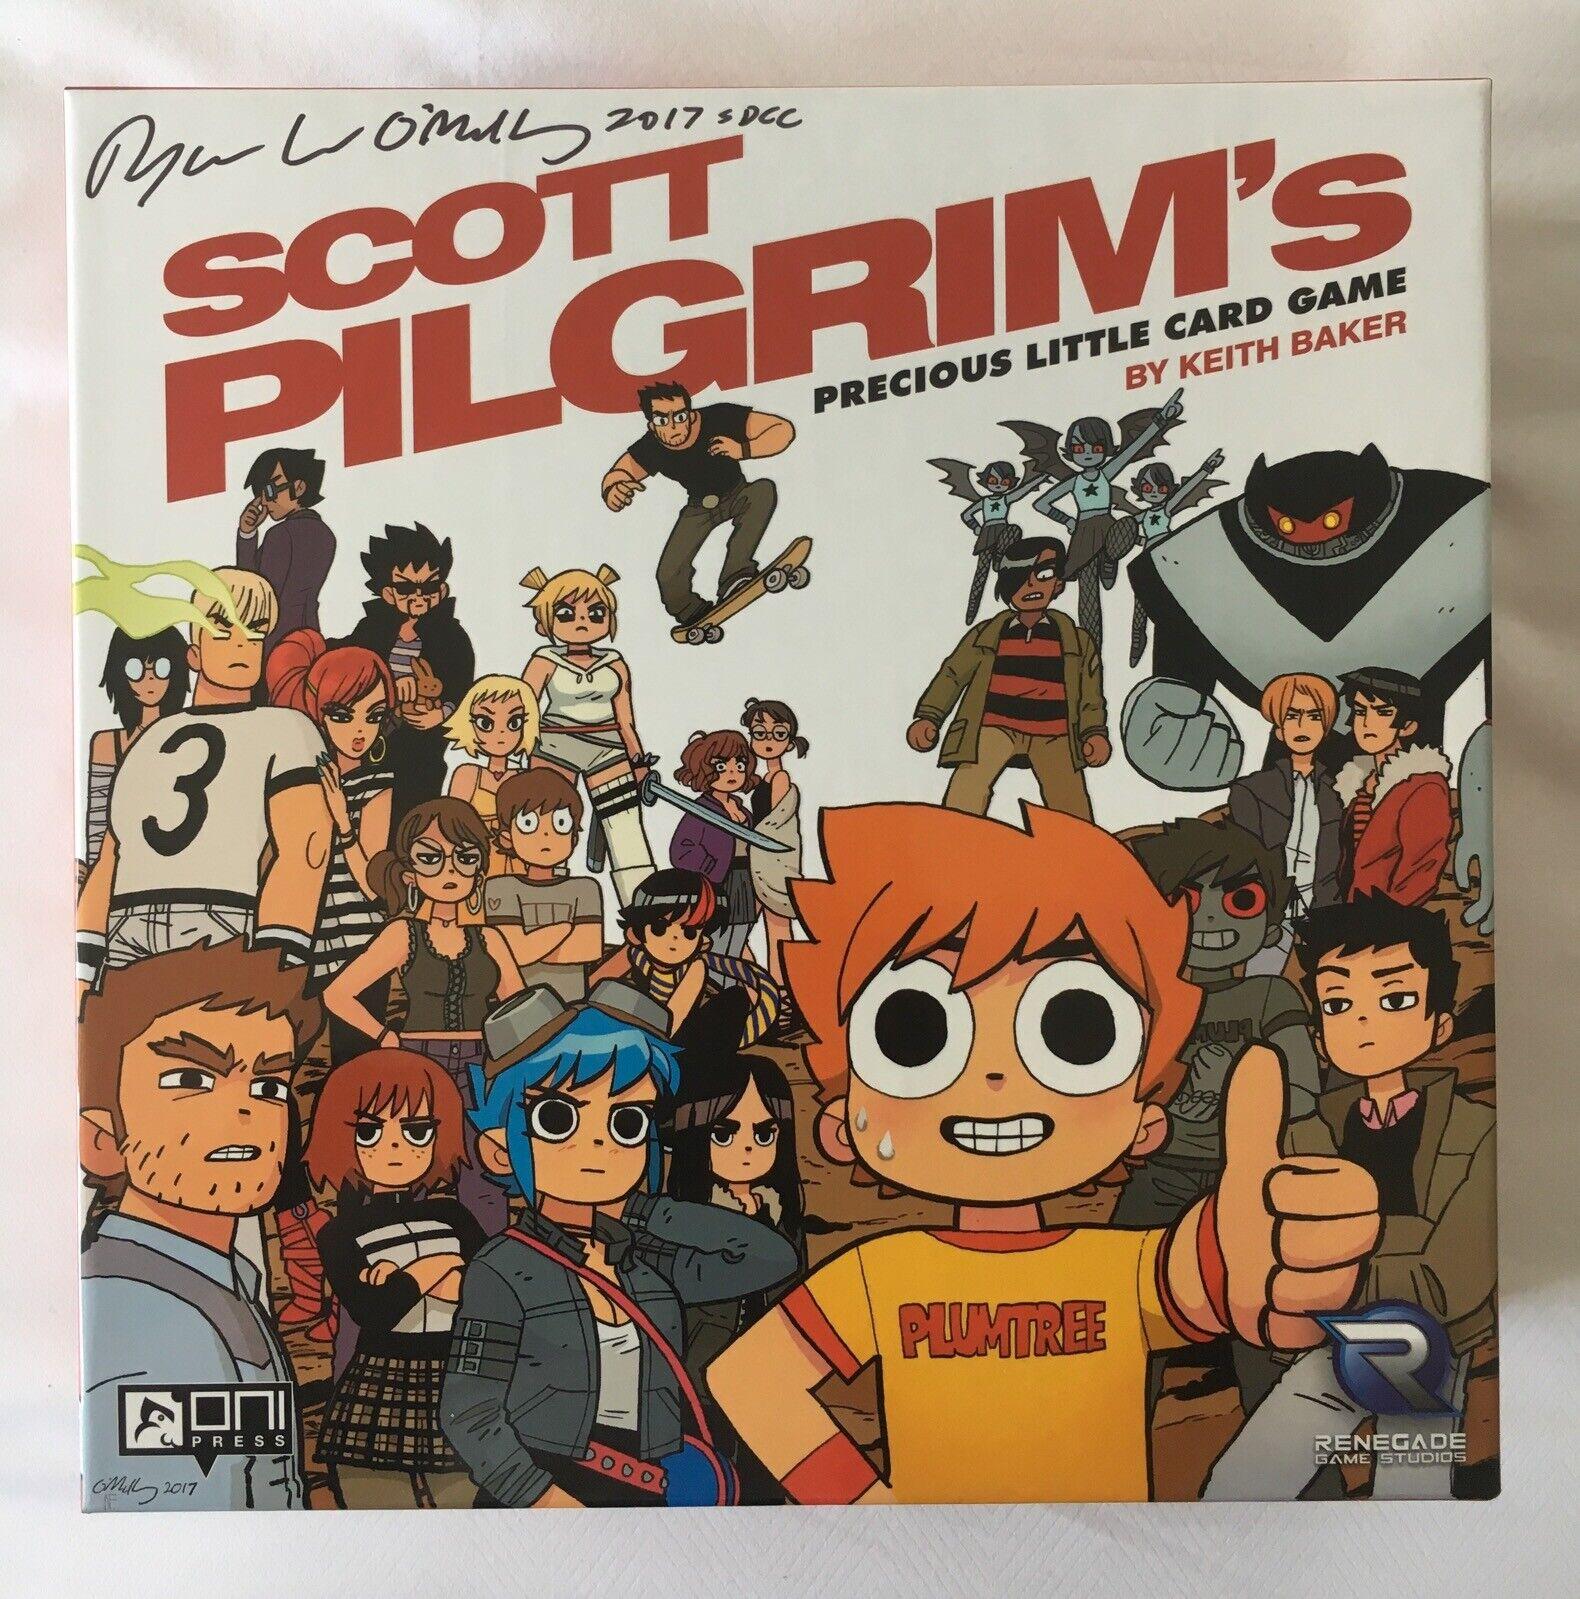 Scott Pilgrim's Precious Little Little Little Card Game - BNIB SIGNED exclusive b78bab